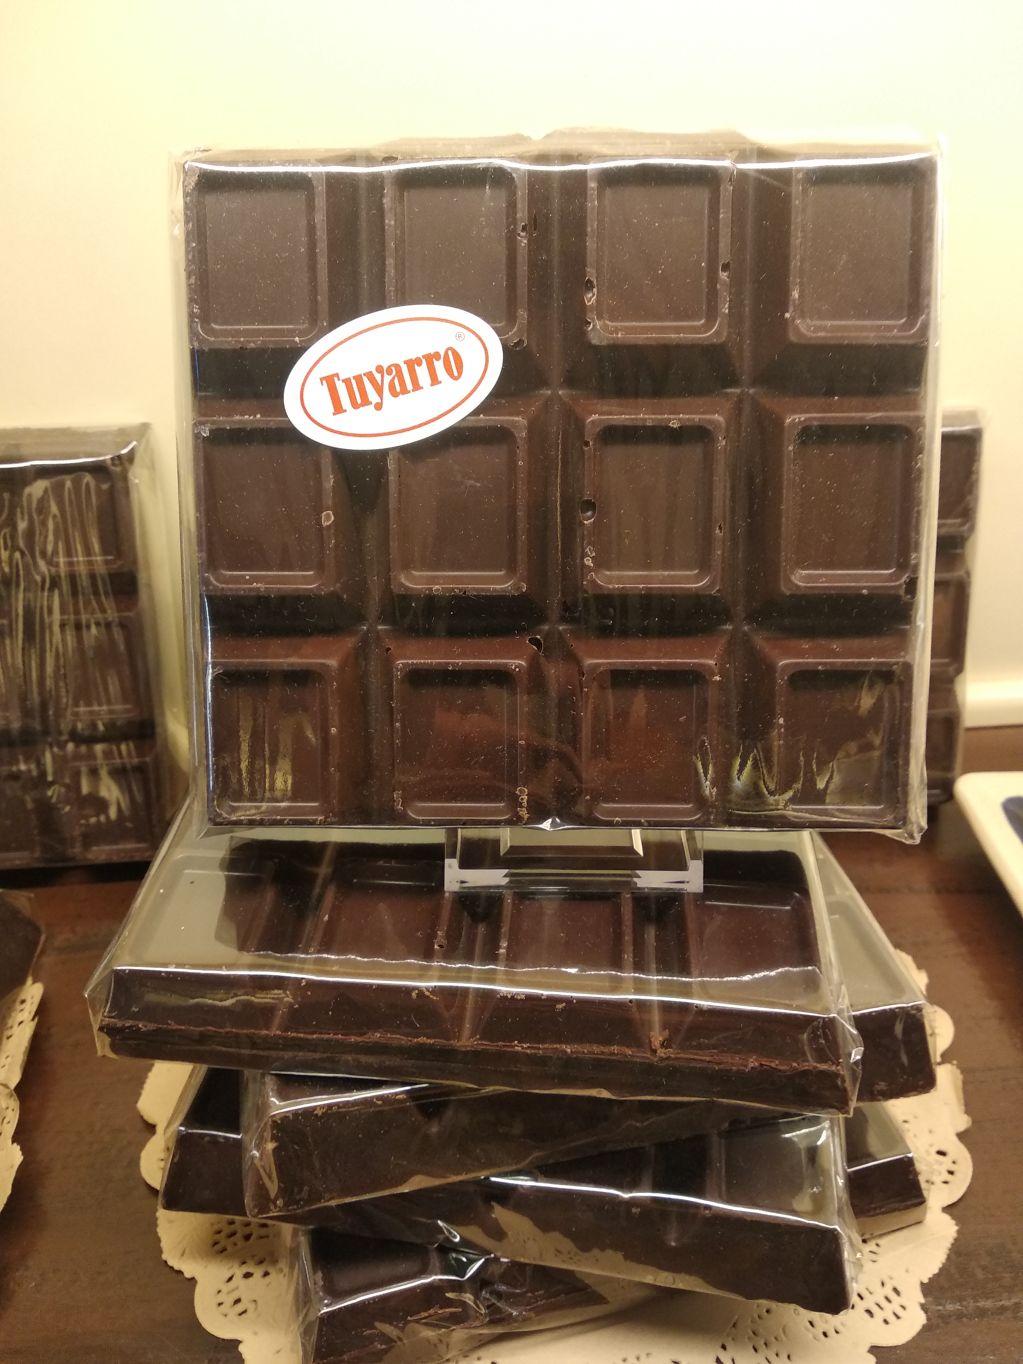 Xocolata cobertura 600 gr - ee5f5-IMG_20200901_100354_i439.jpg